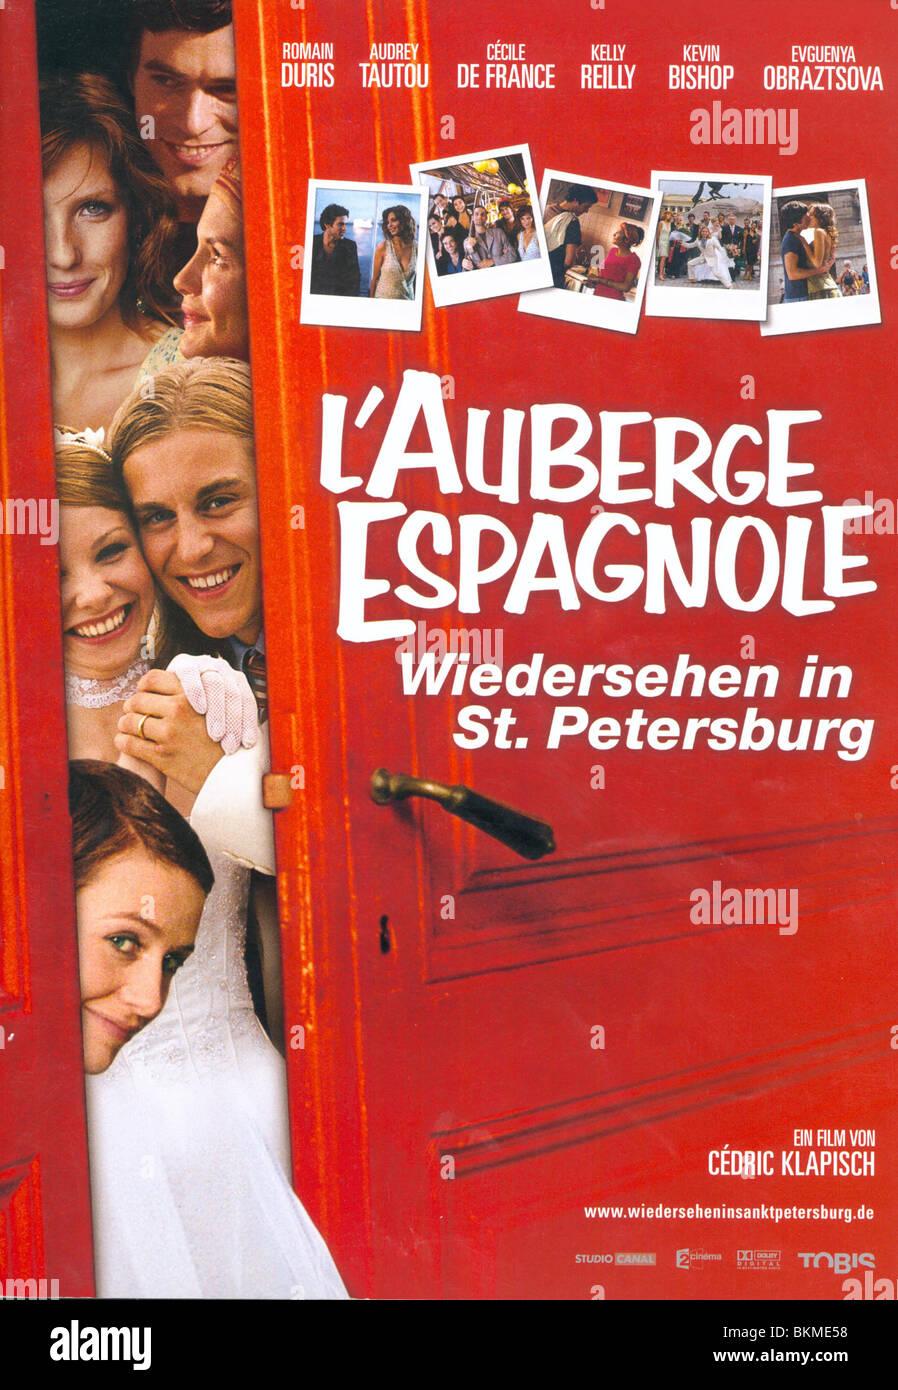 L'AUBERGE ESPAGNOLE (2002) POT LUCK (ALT) POSTER AUBE 001-01 - Stock Image